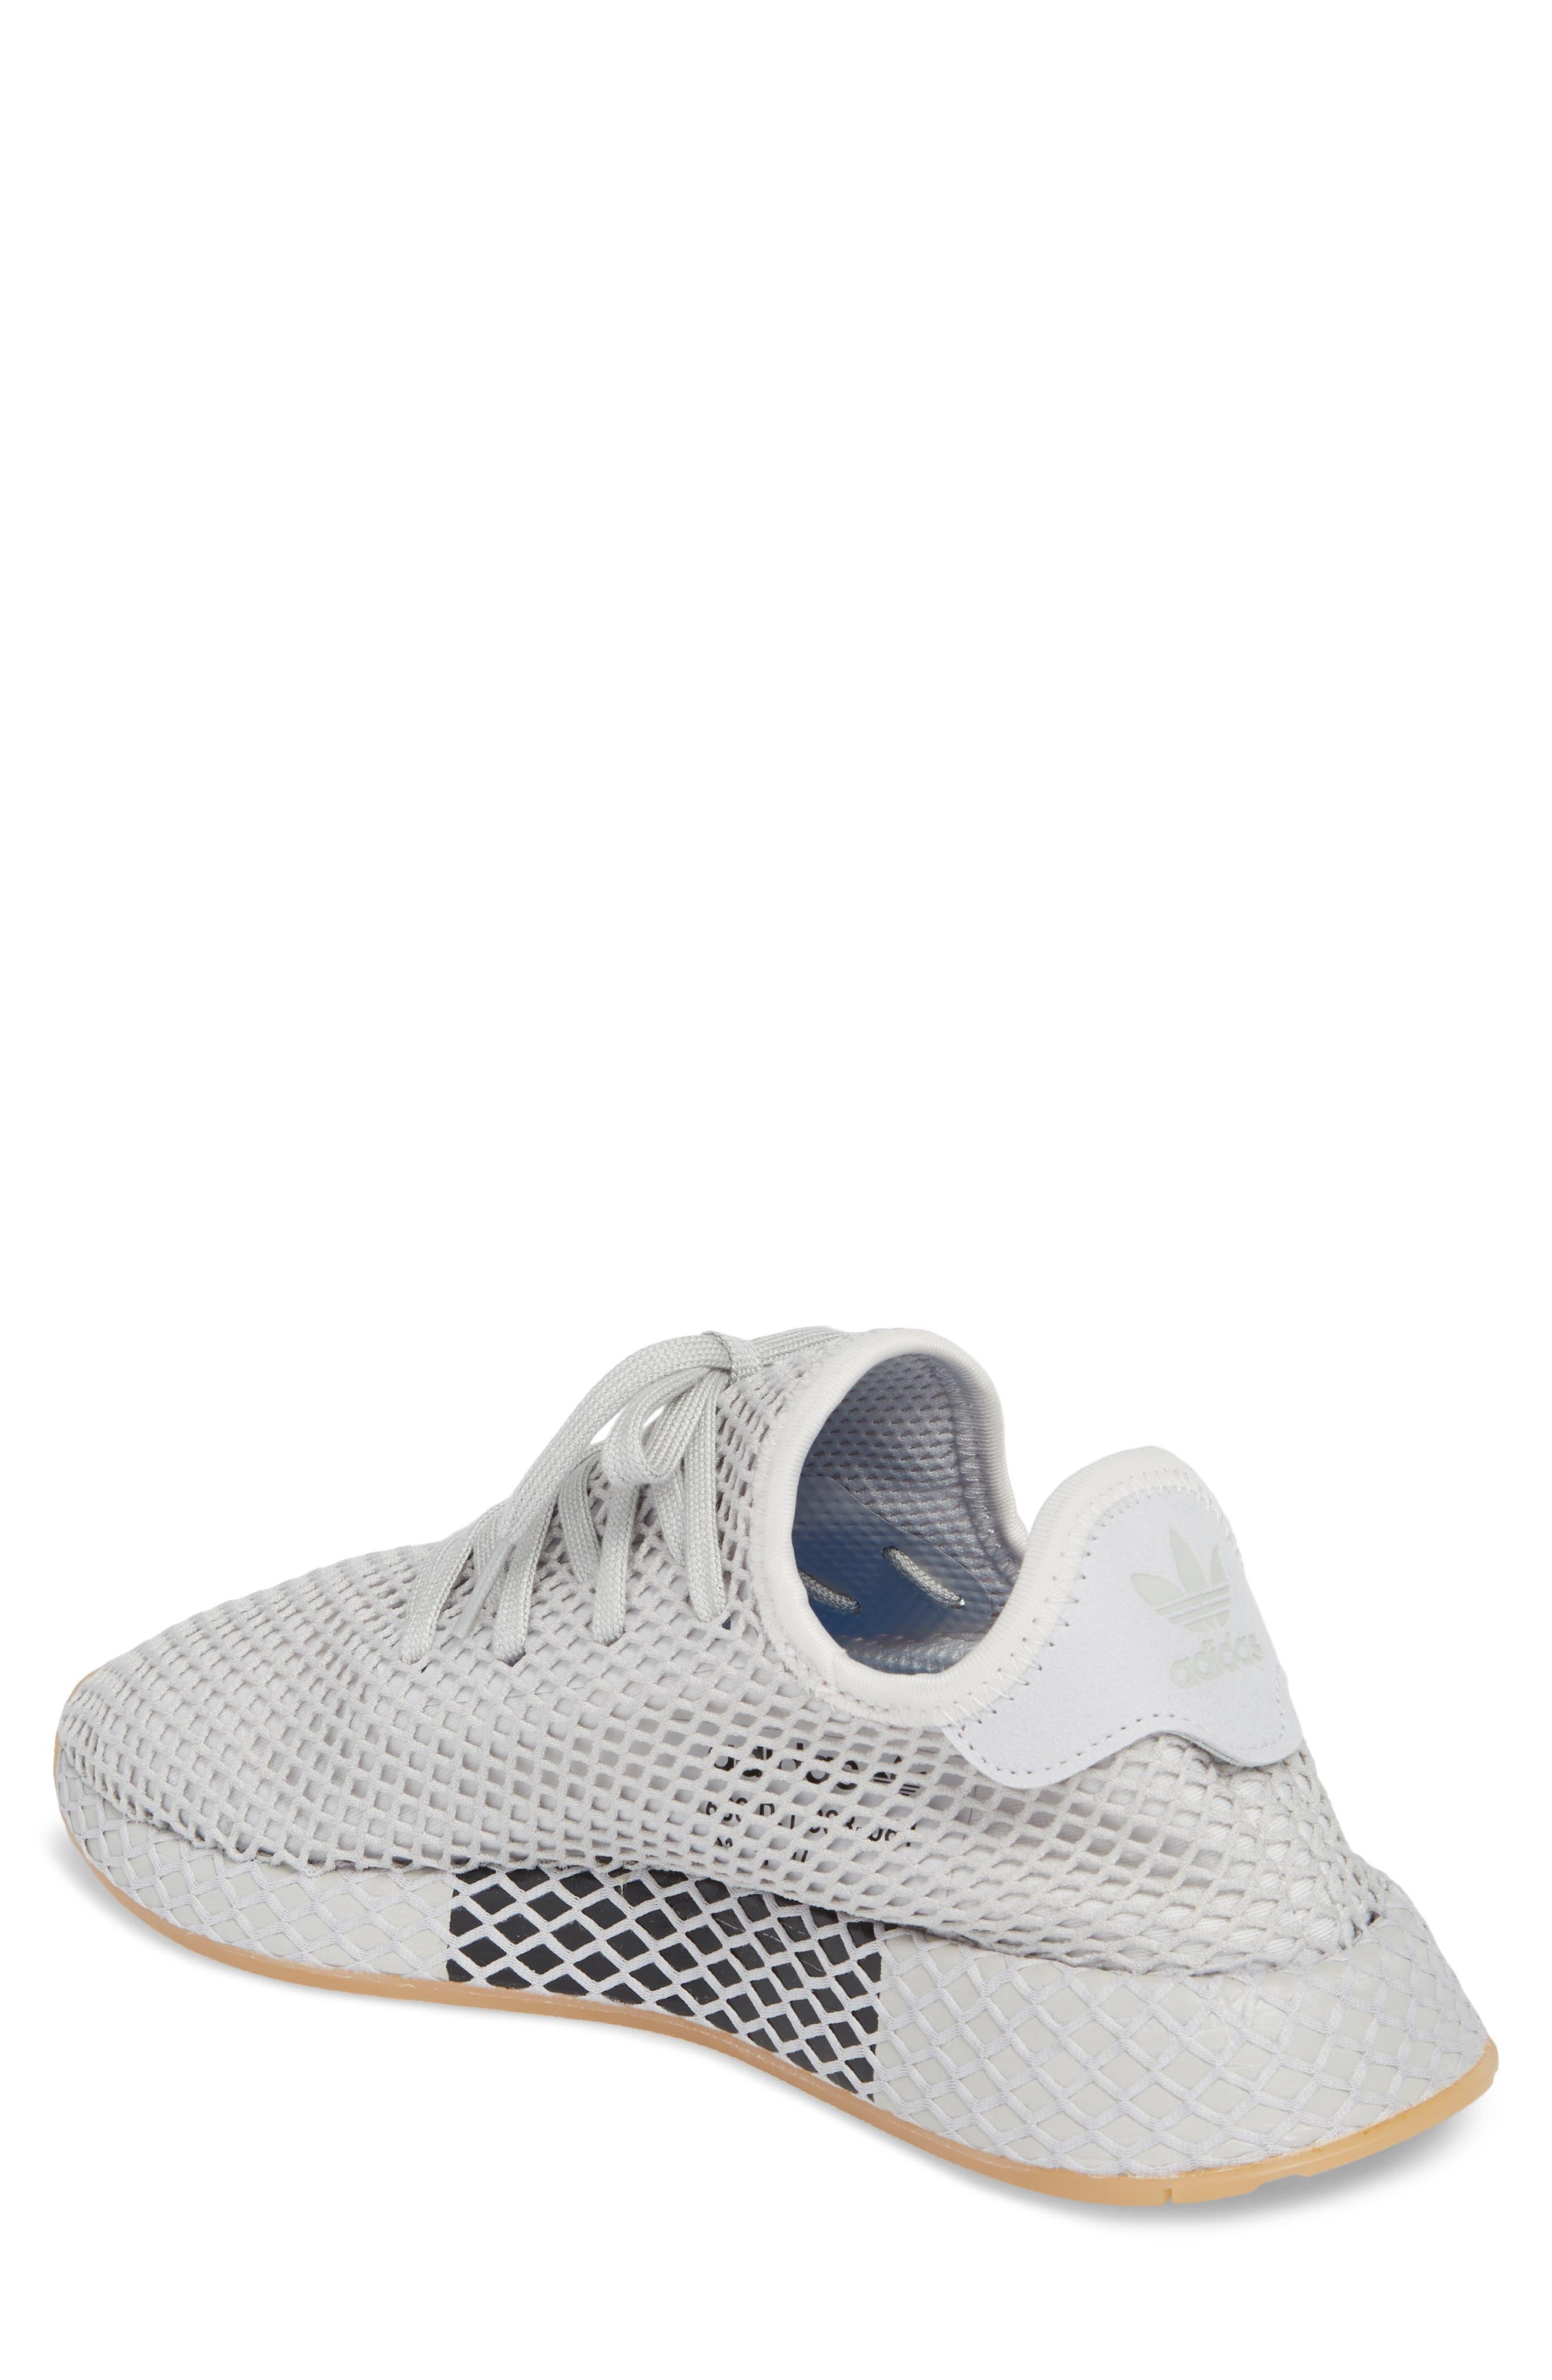 Deerupt Runner Sneaker,                             Alternate thumbnail 20, color,